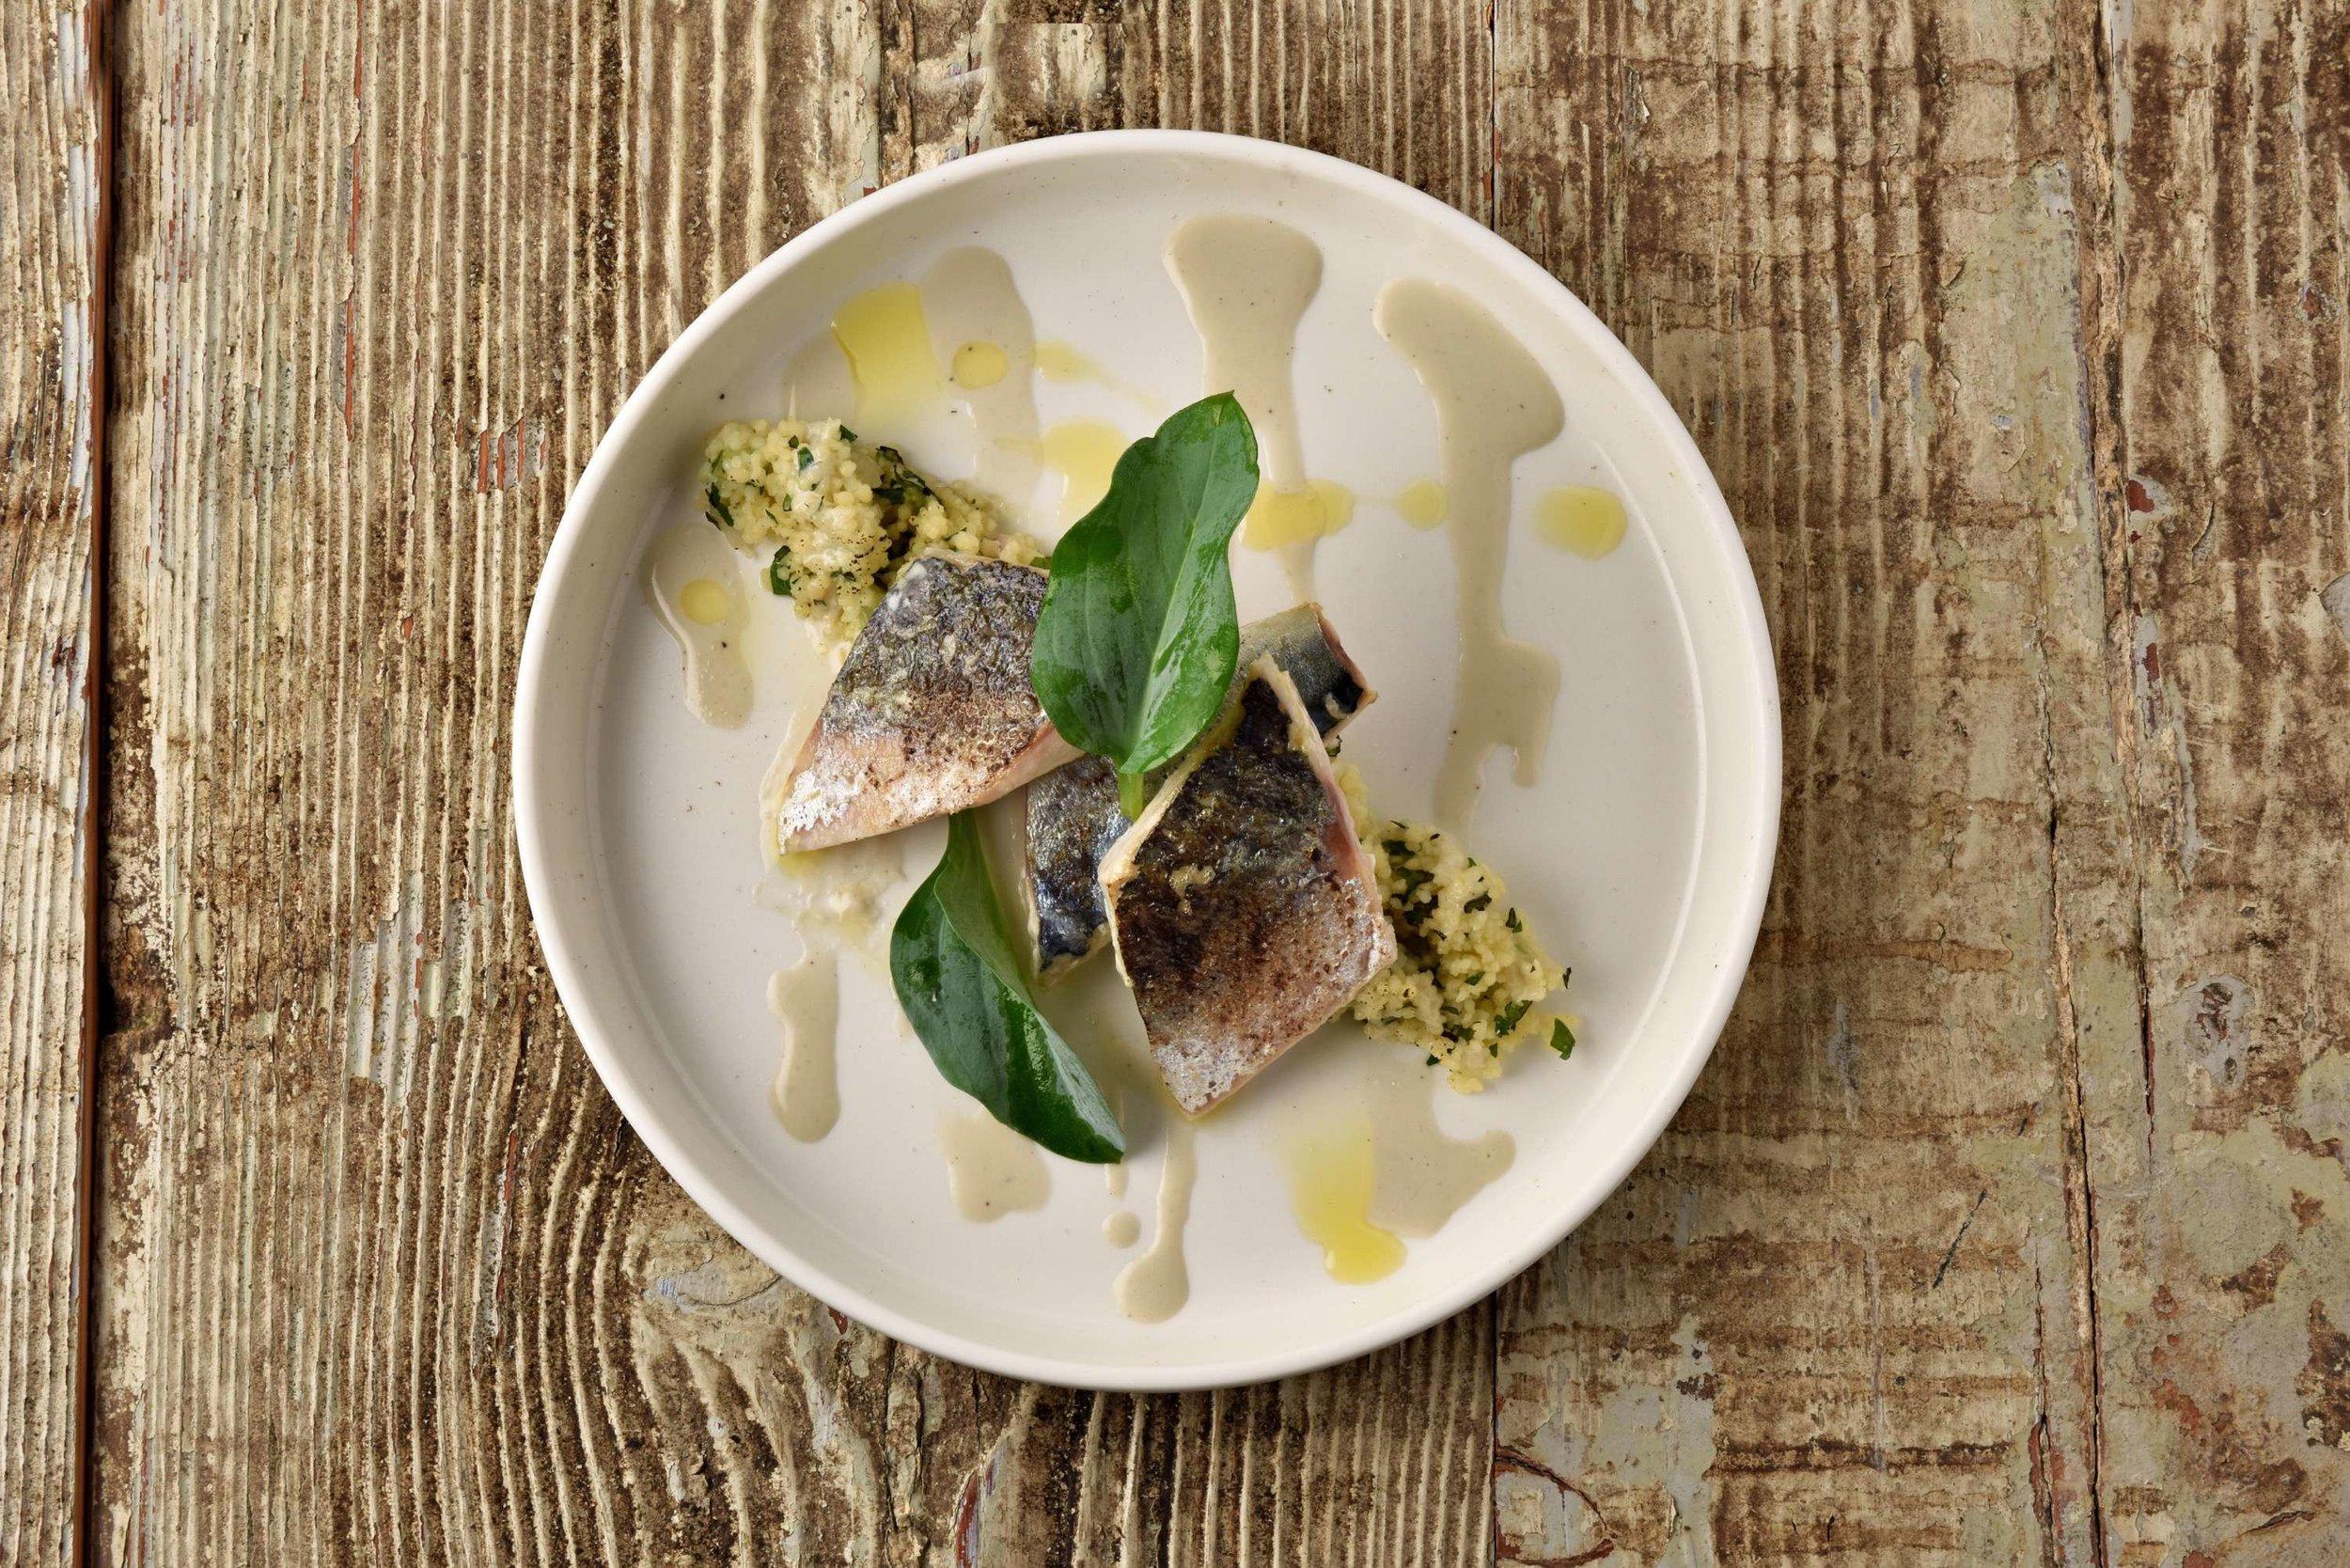 5 dome sur mer seafood schaal schelp kreeft restaurant bistro antwerpen frederic chabbert michelinstar bart albrecht tablefever.jpg